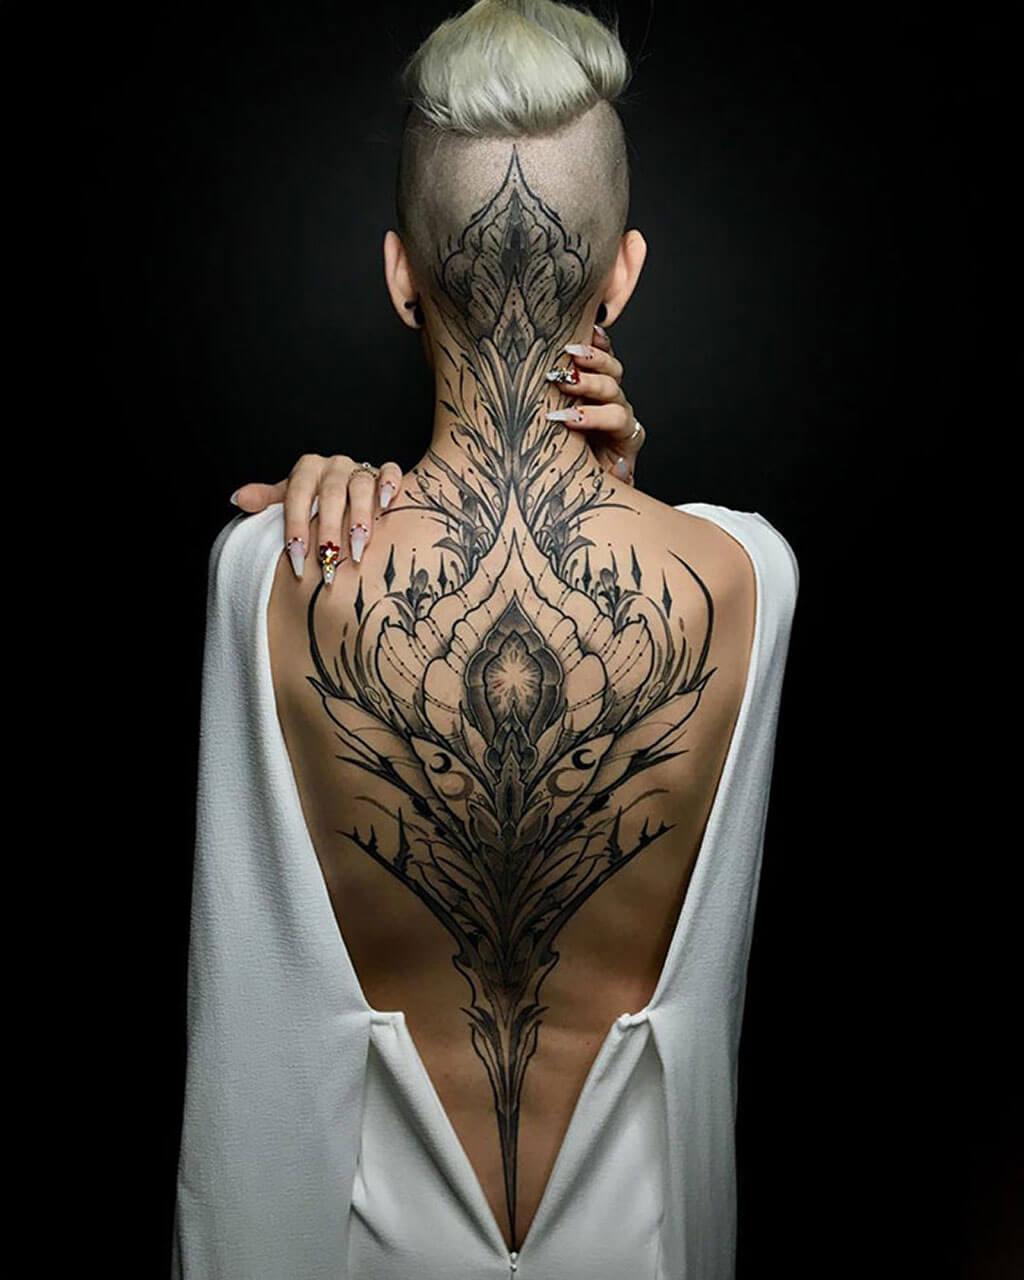 Beautiful, intricate designs